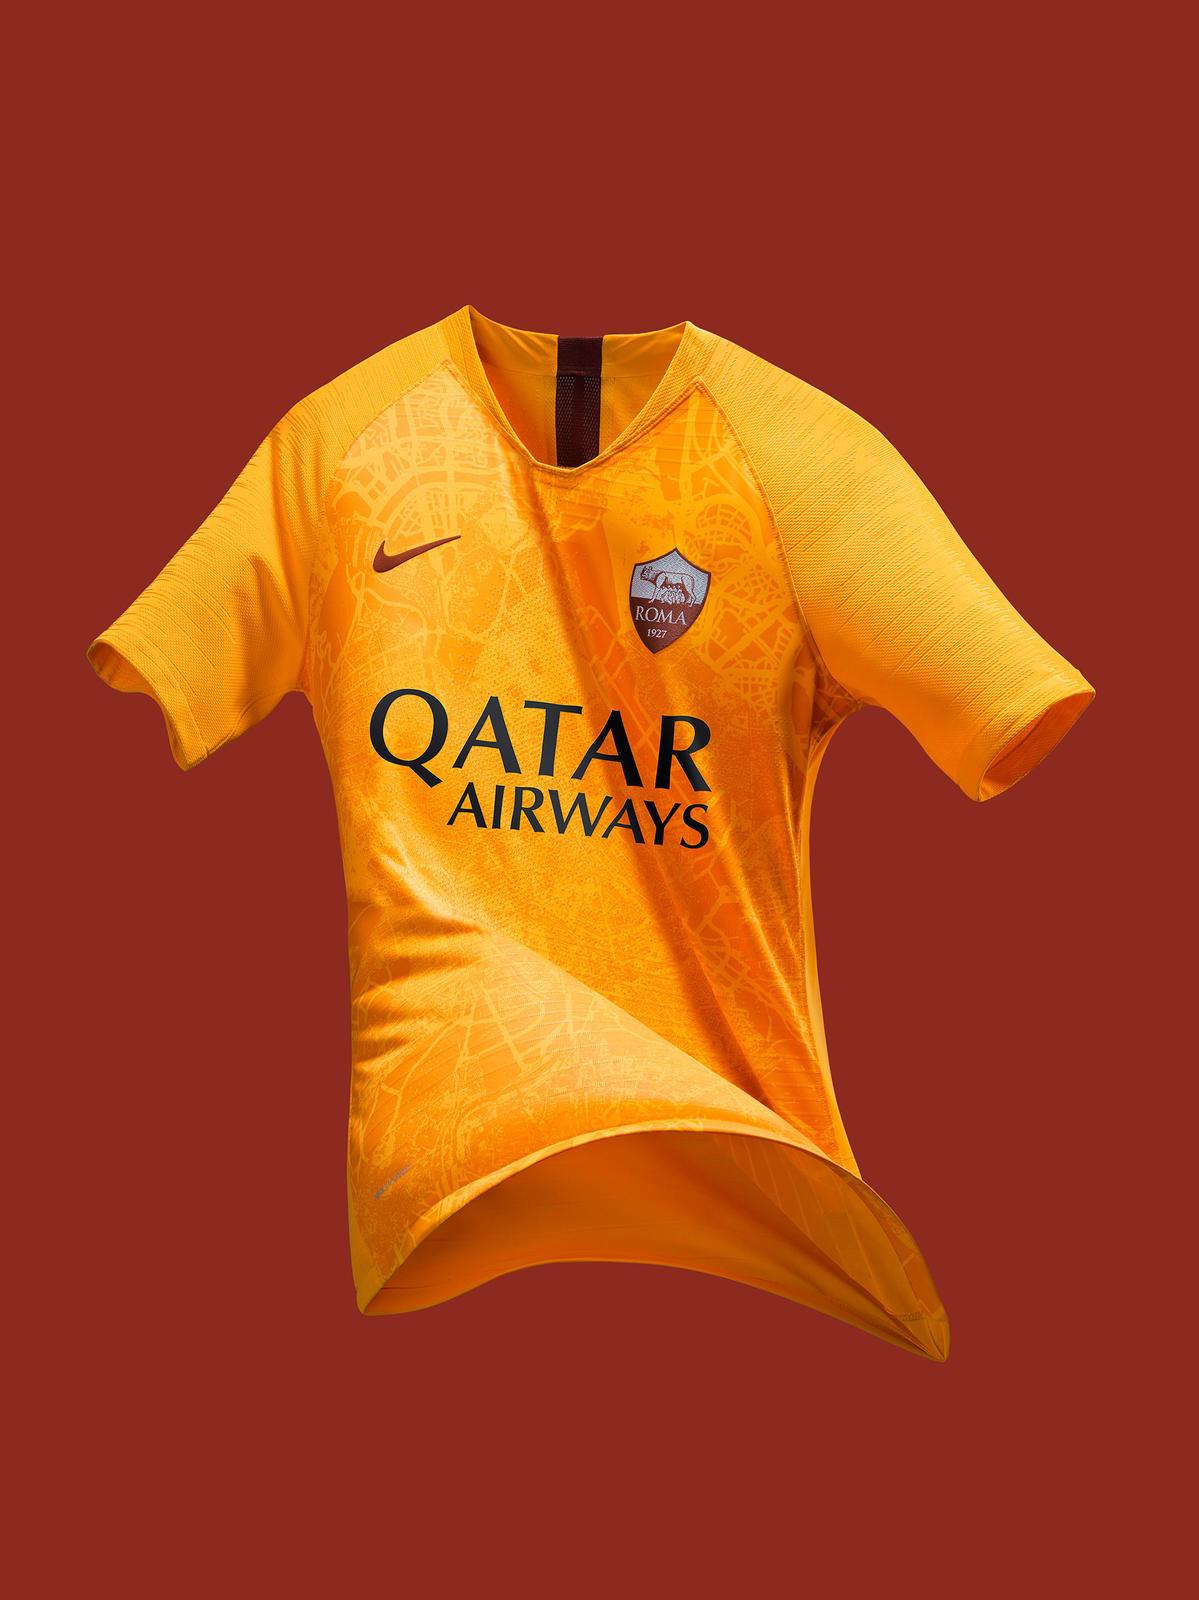 3aa81c52aa251 Roma capricha em nova camisa 3 amarela para a temporada